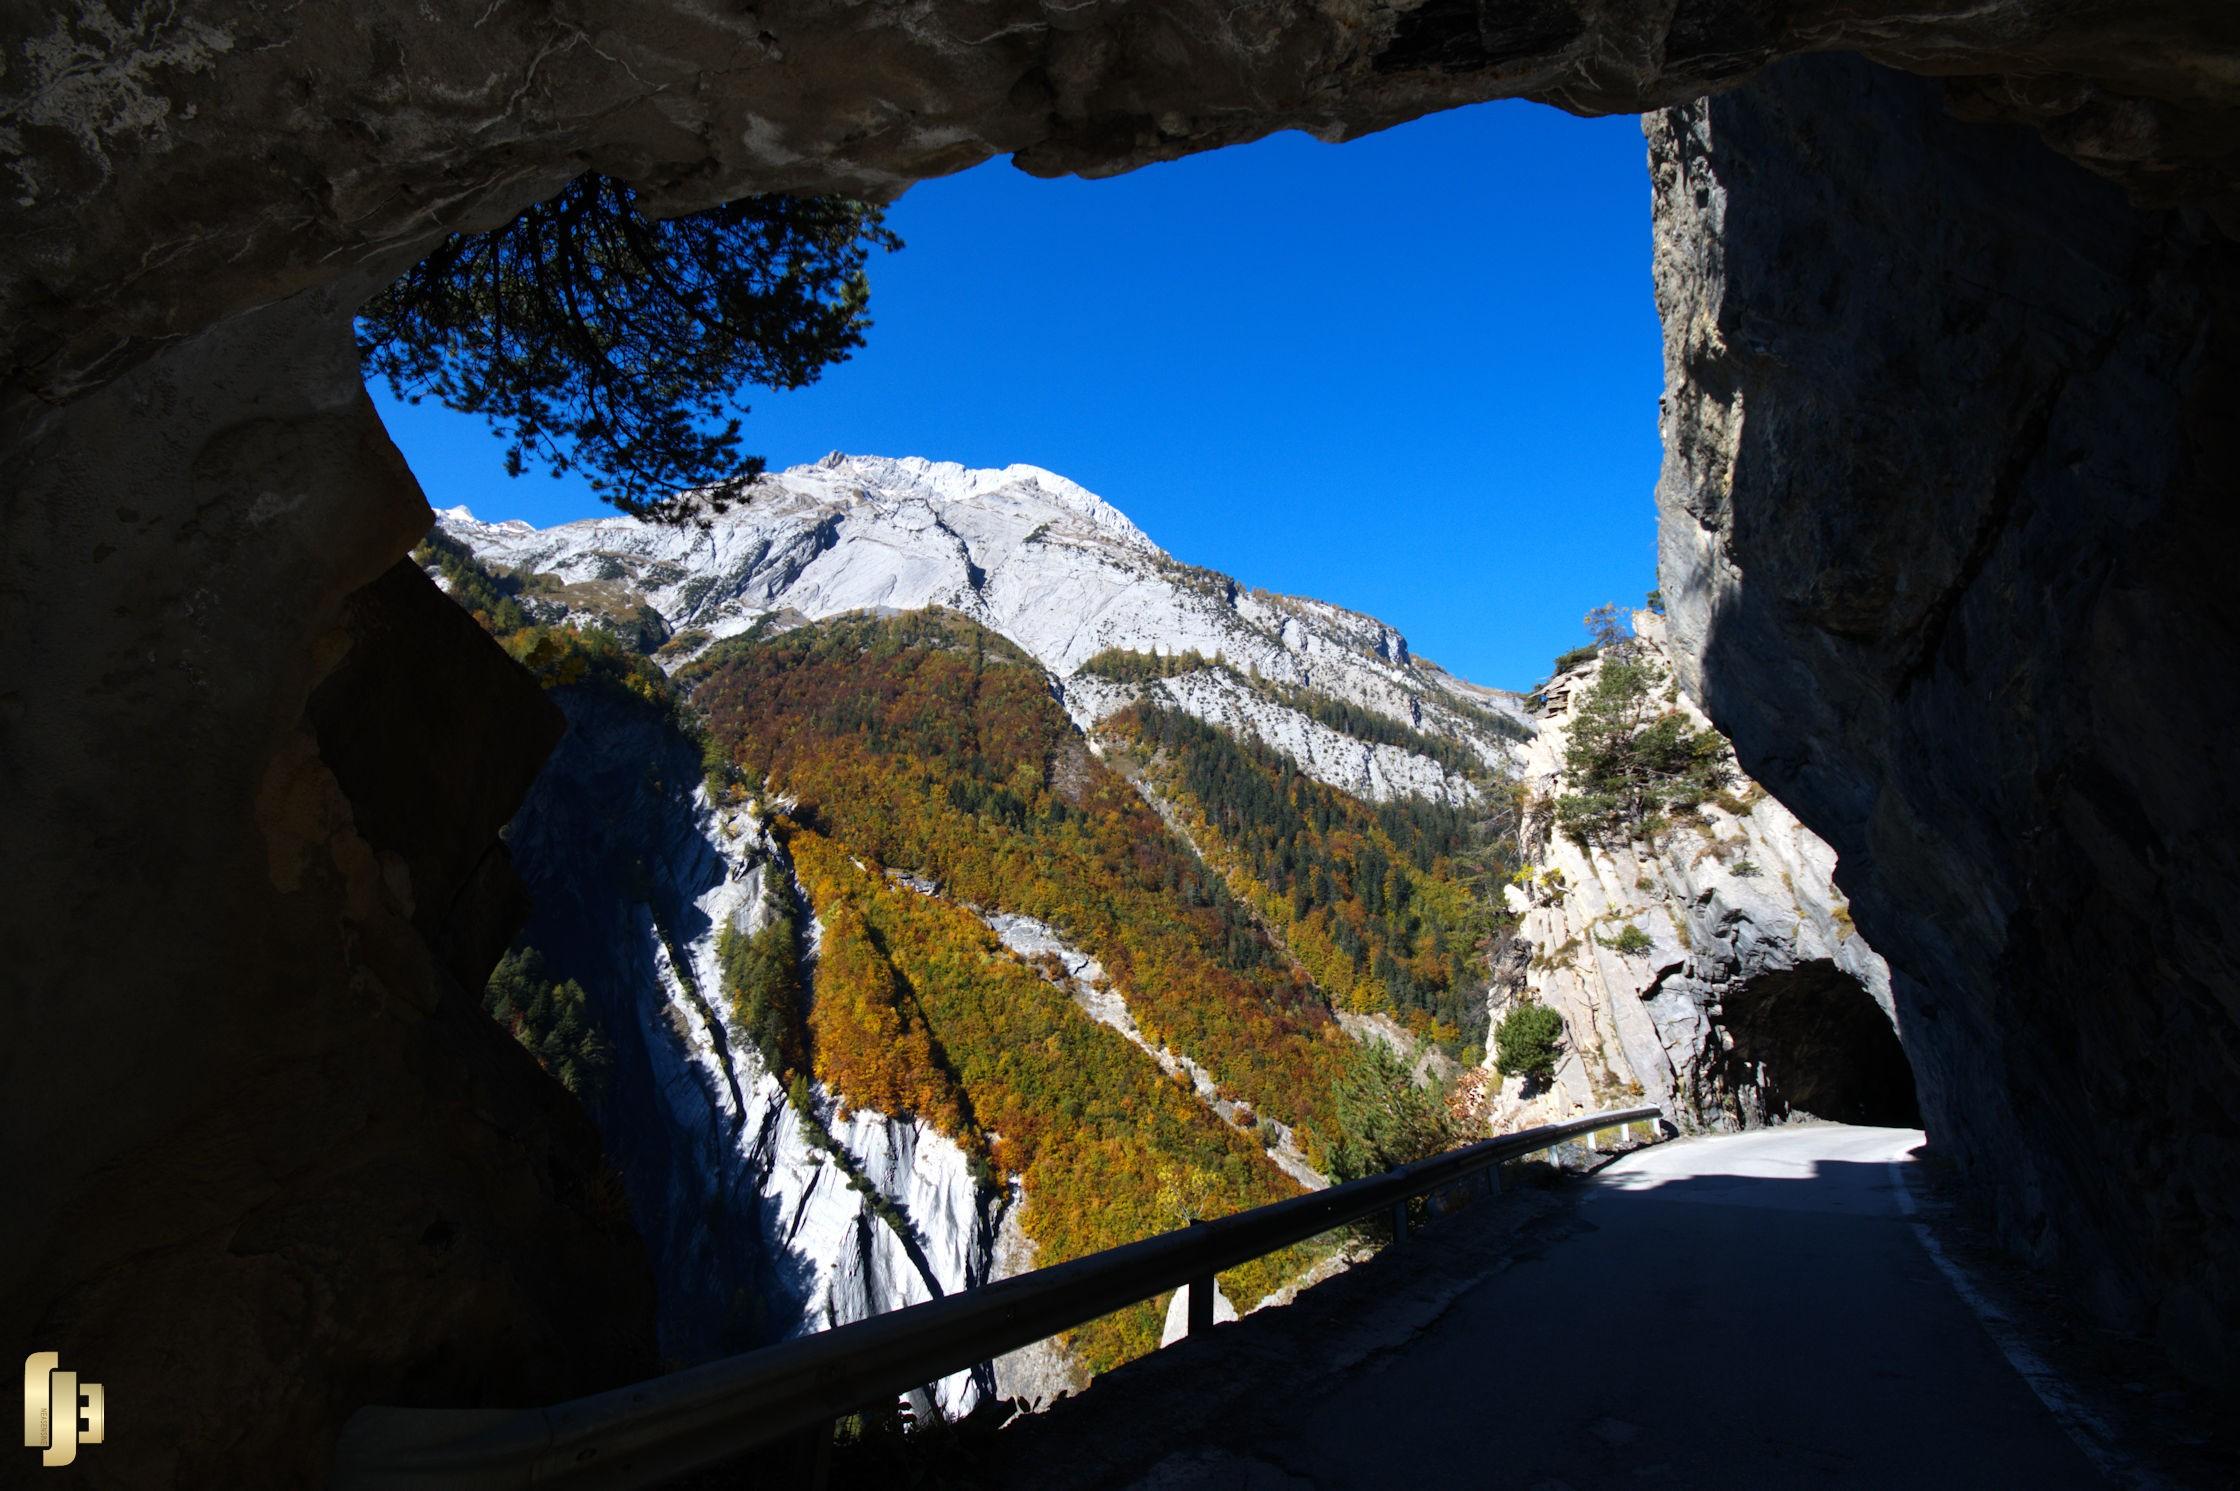 L'automne sort du tunnel